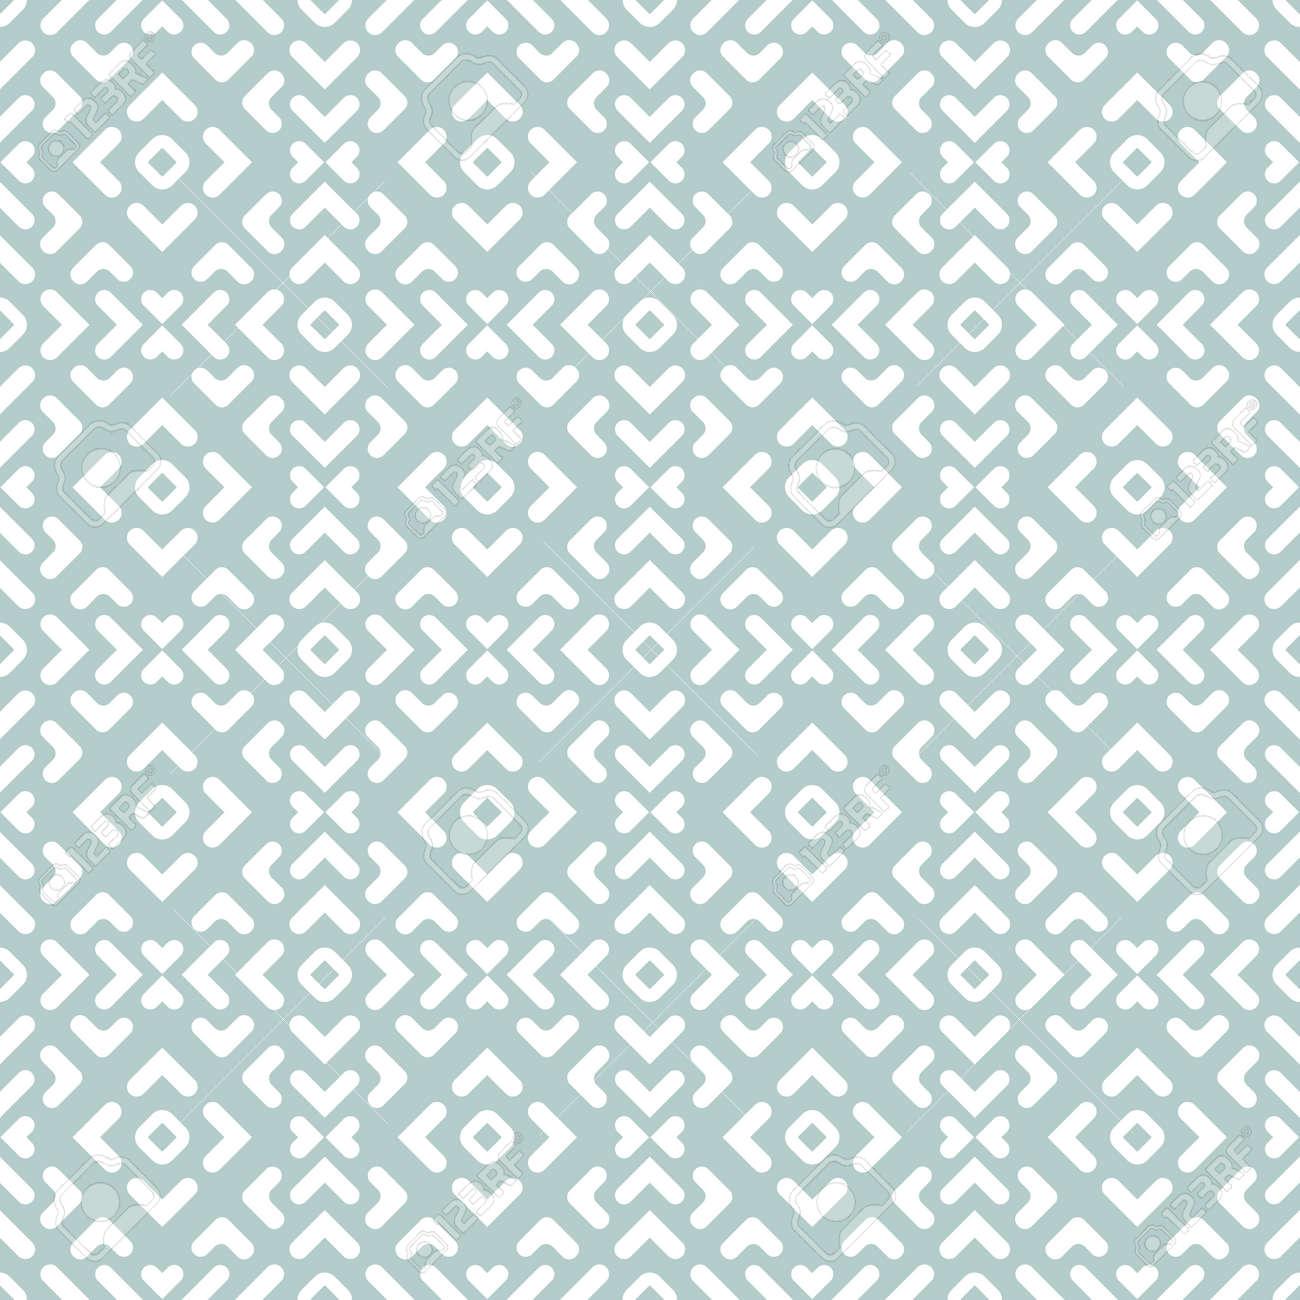 Seamless Geometric Light Blue and White Background - 167039512